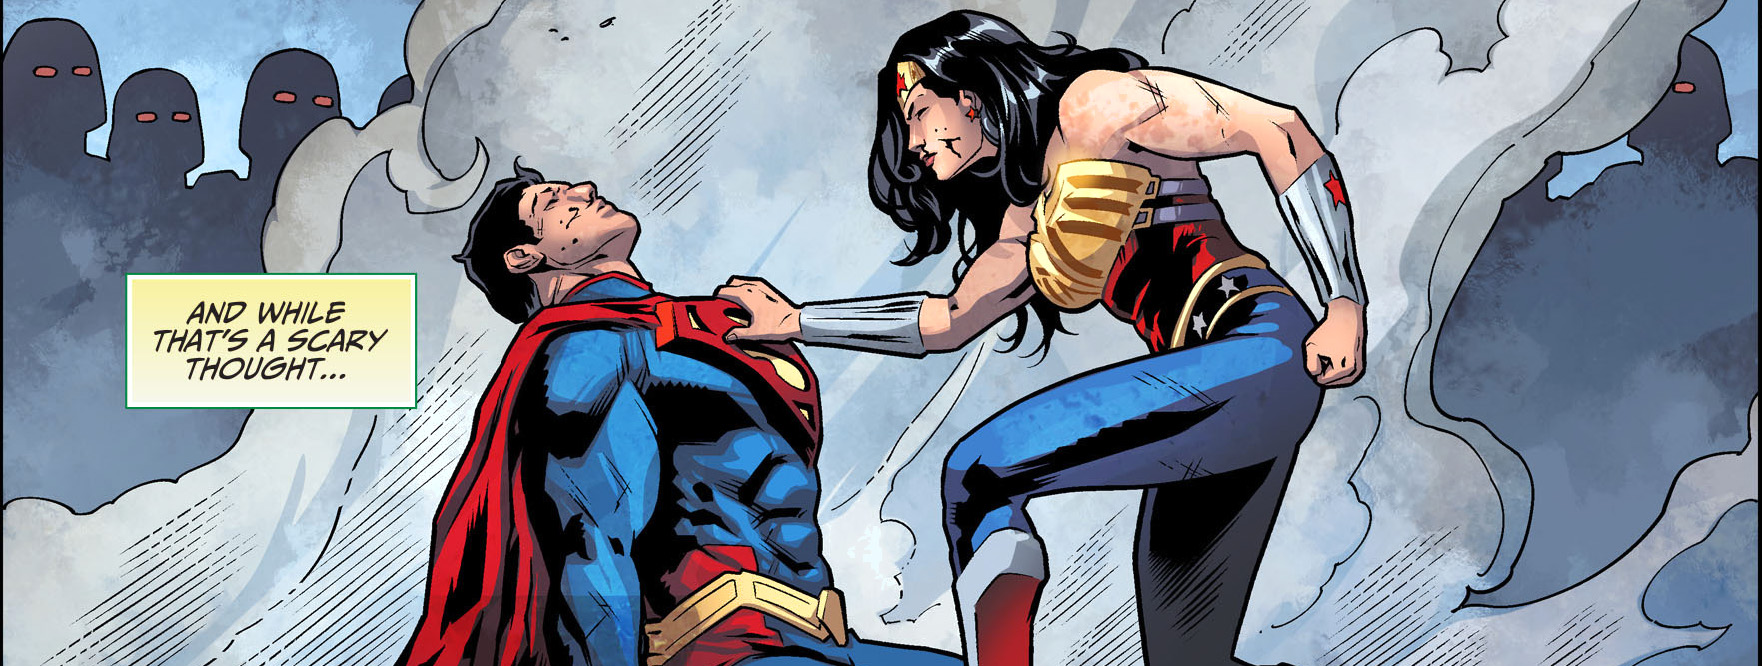 wonder woman beats superman injustice gods among us